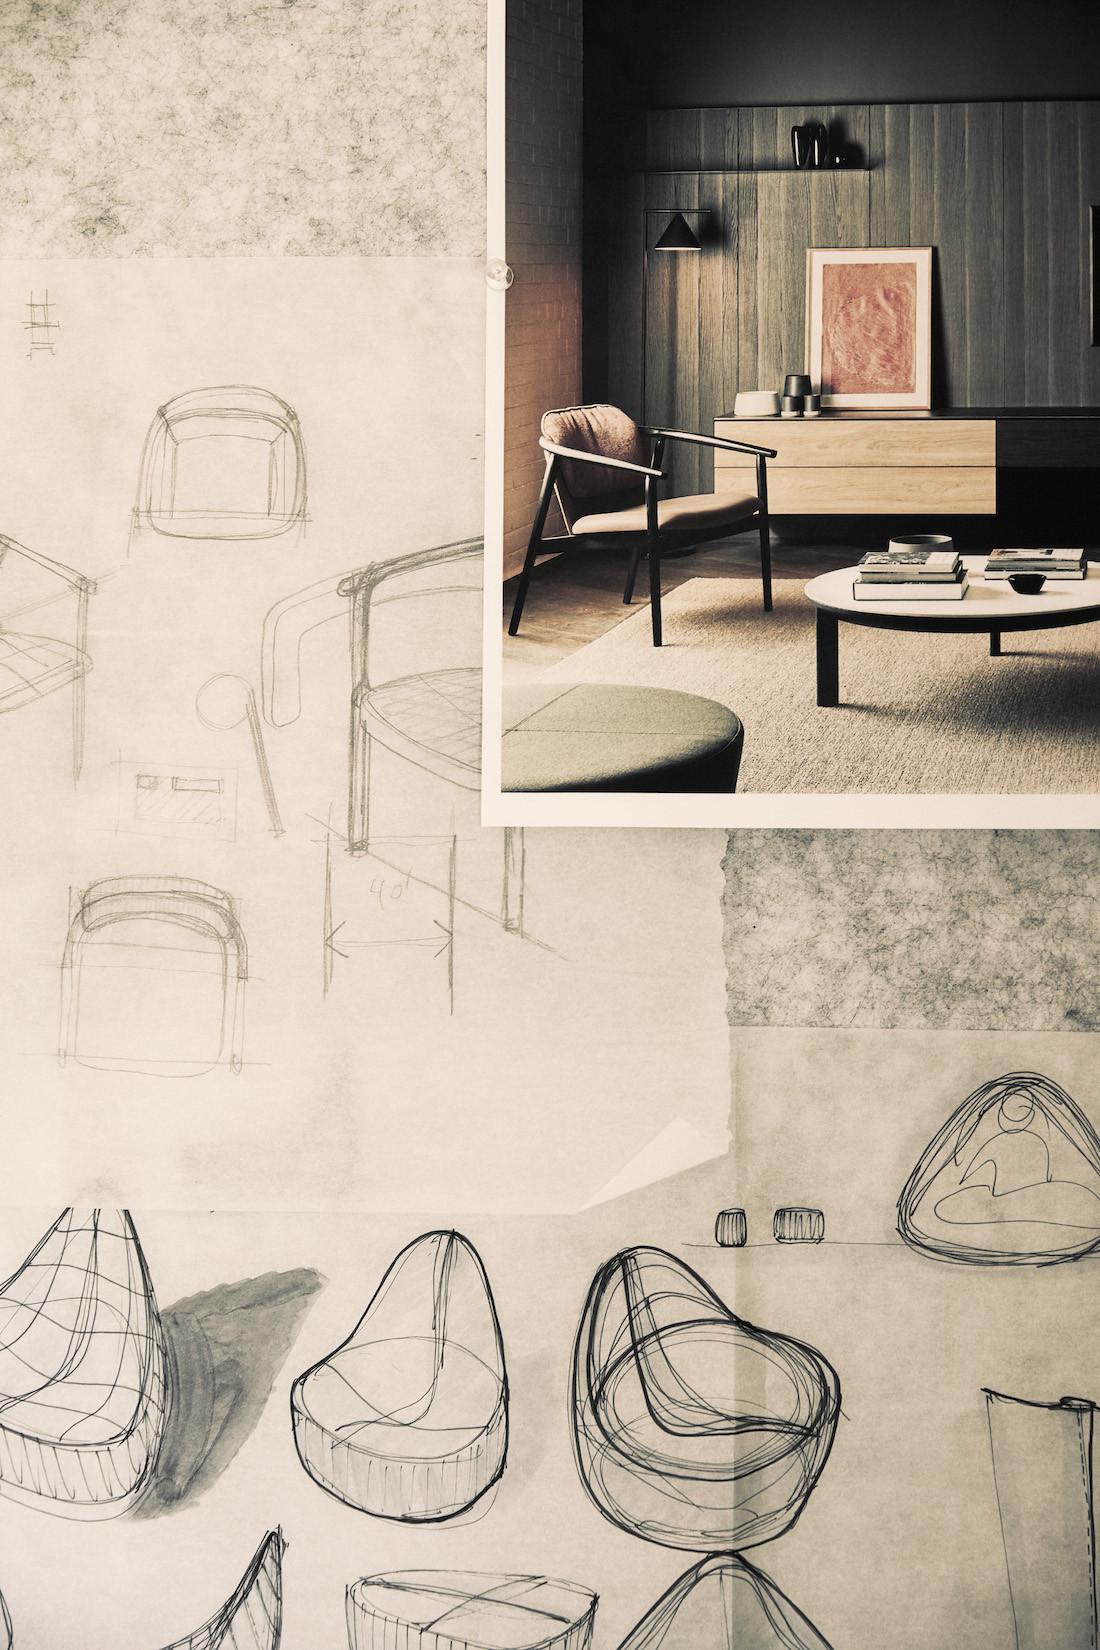 Sketches in the Kett design studio